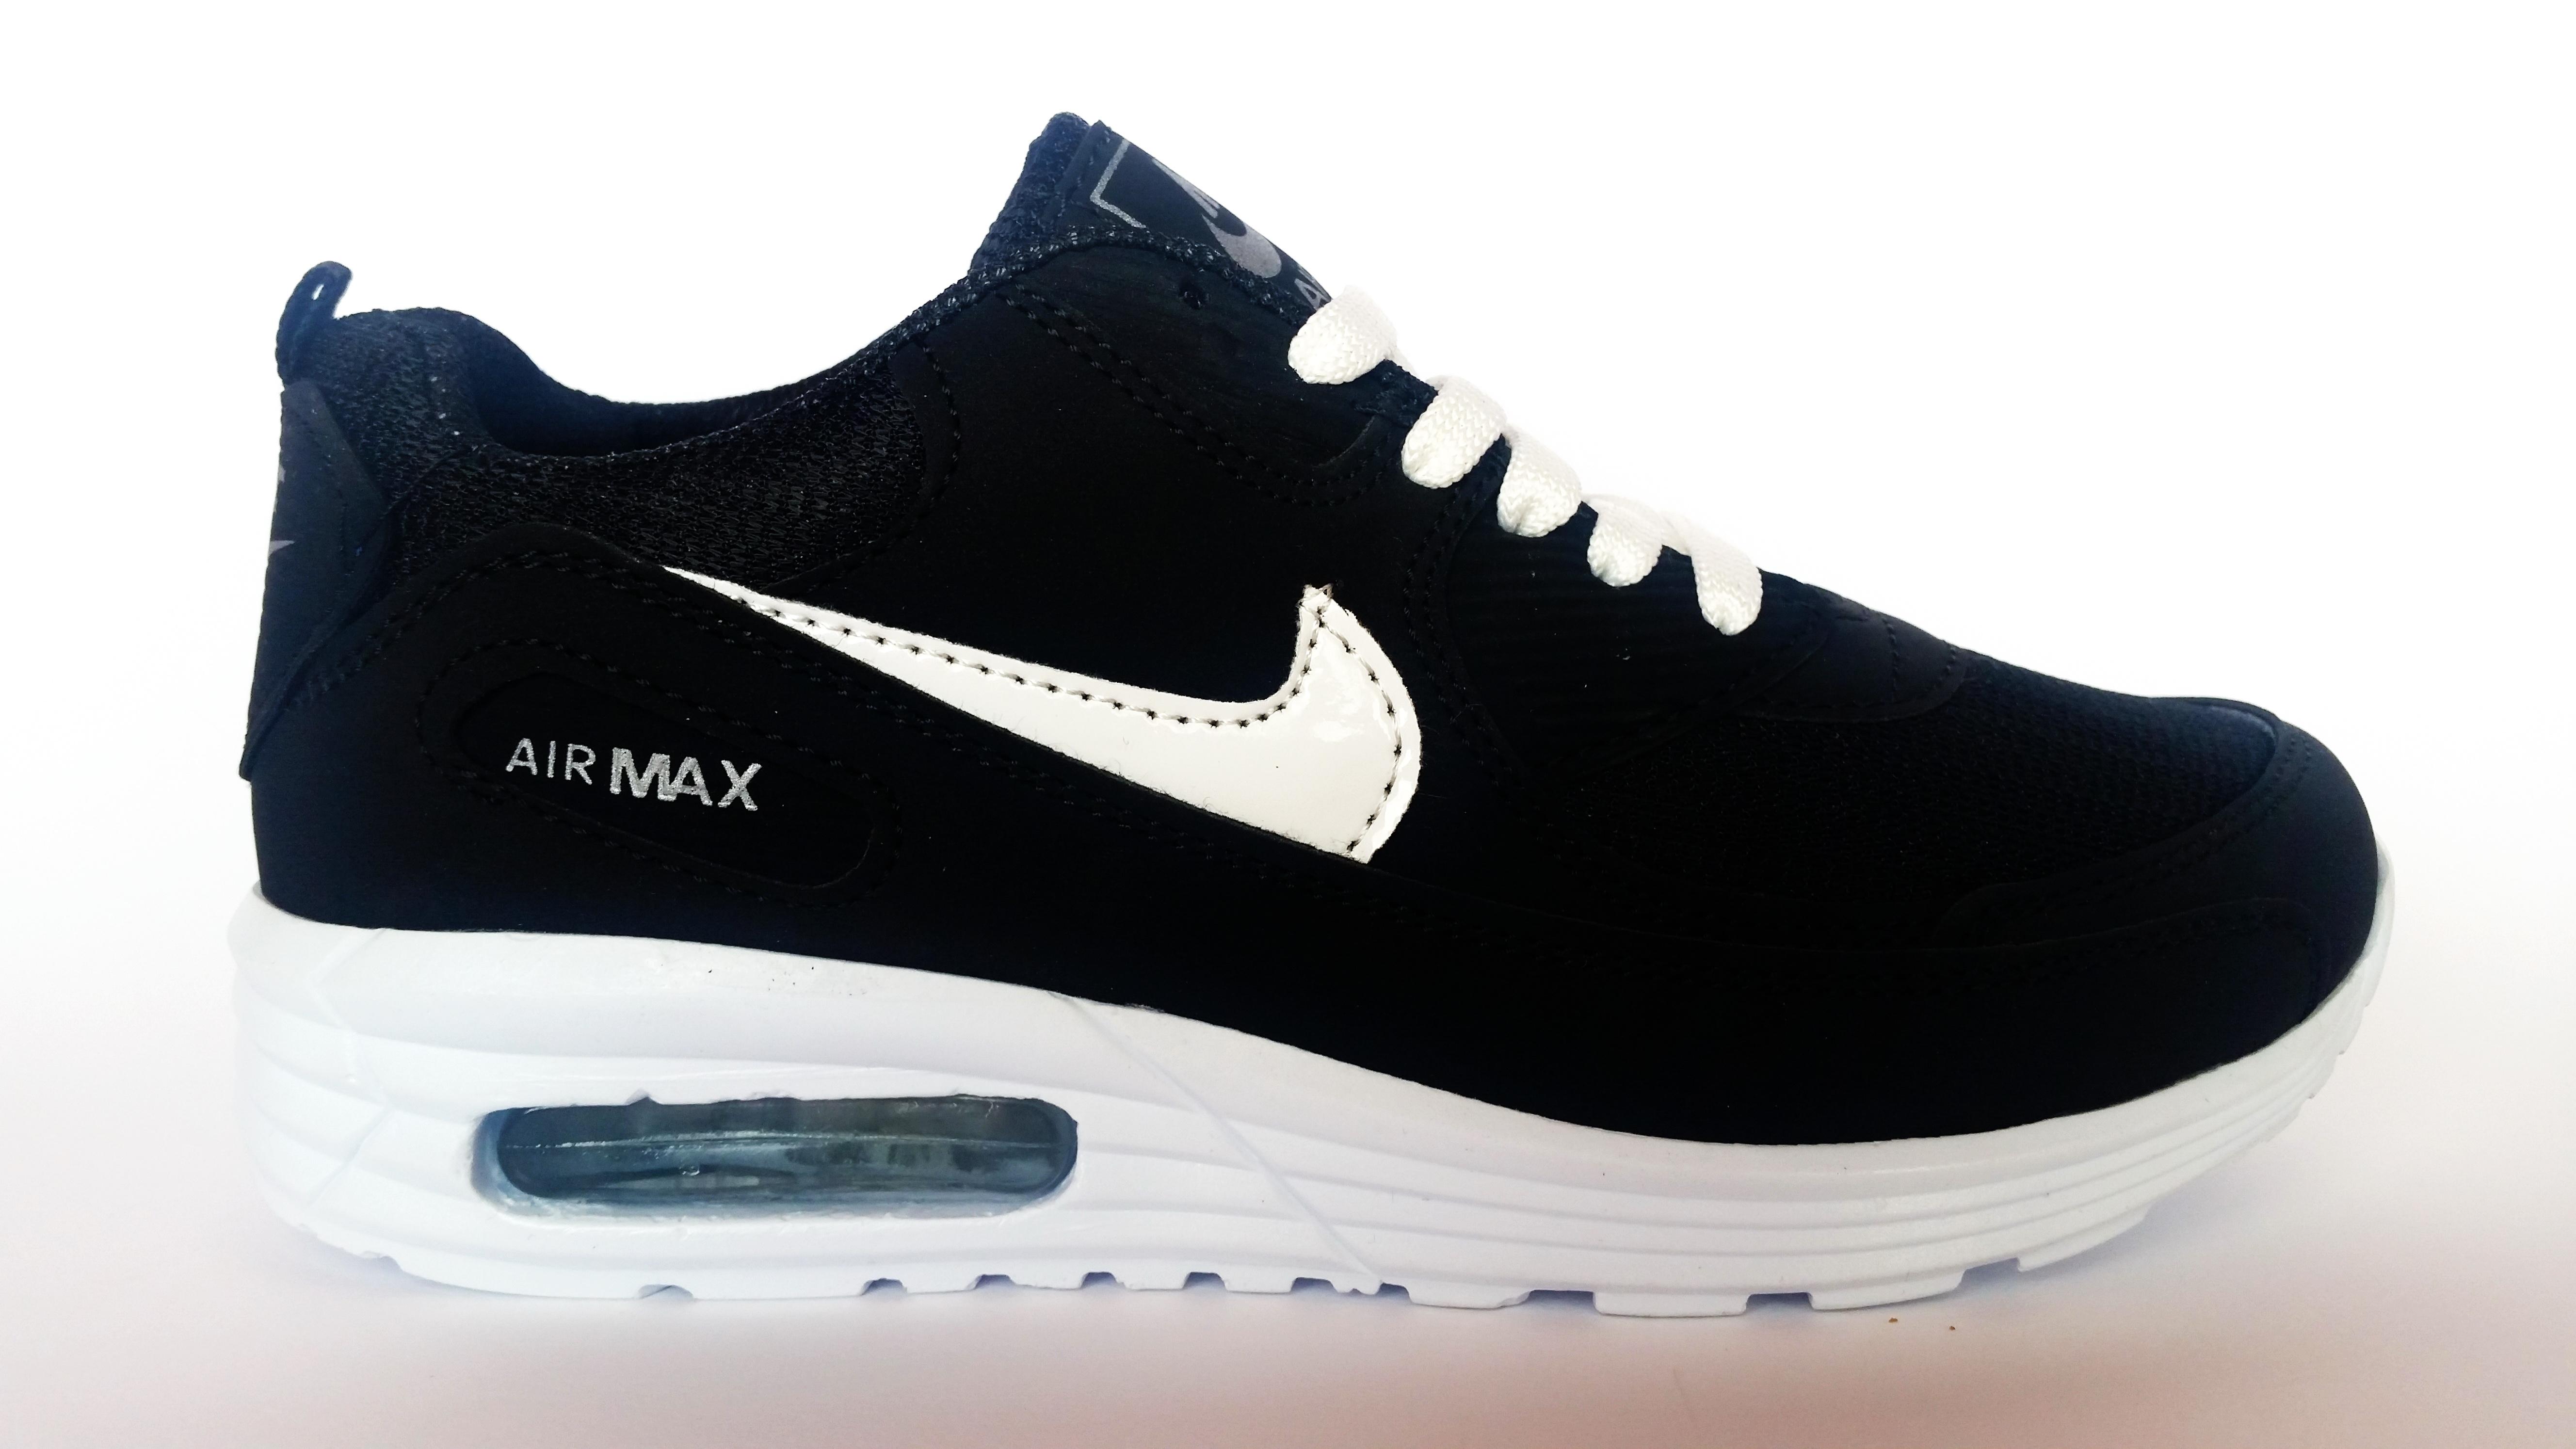 c3d7f15de16 Nike Air Max Код 557-New - Stillbg.com